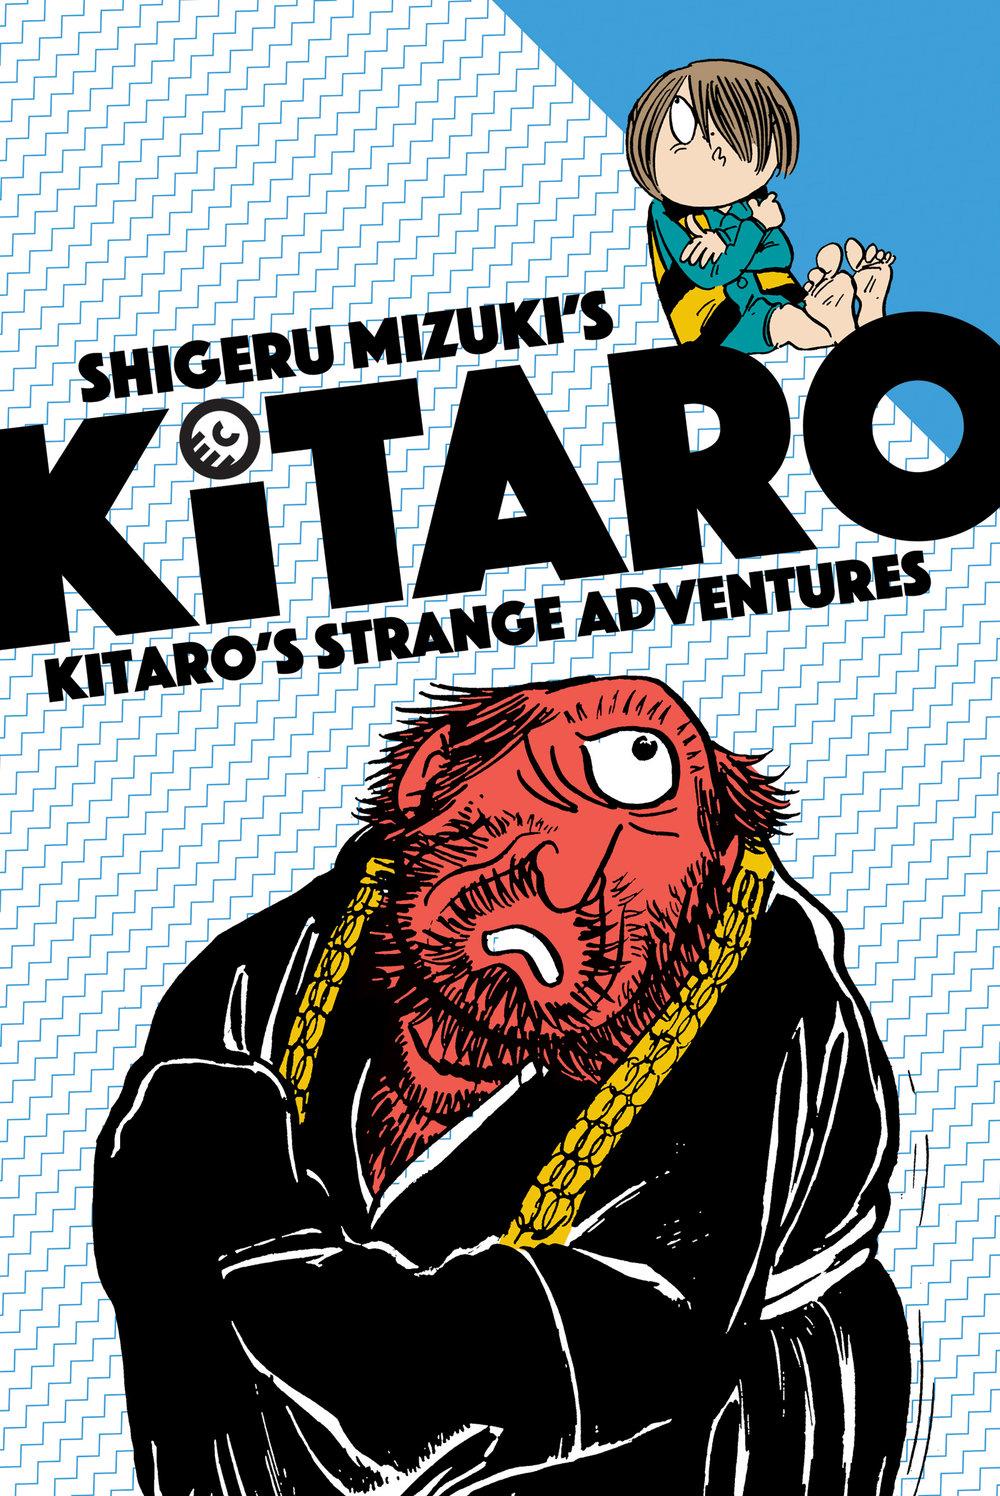 kitaro_strange_adventures.jpg